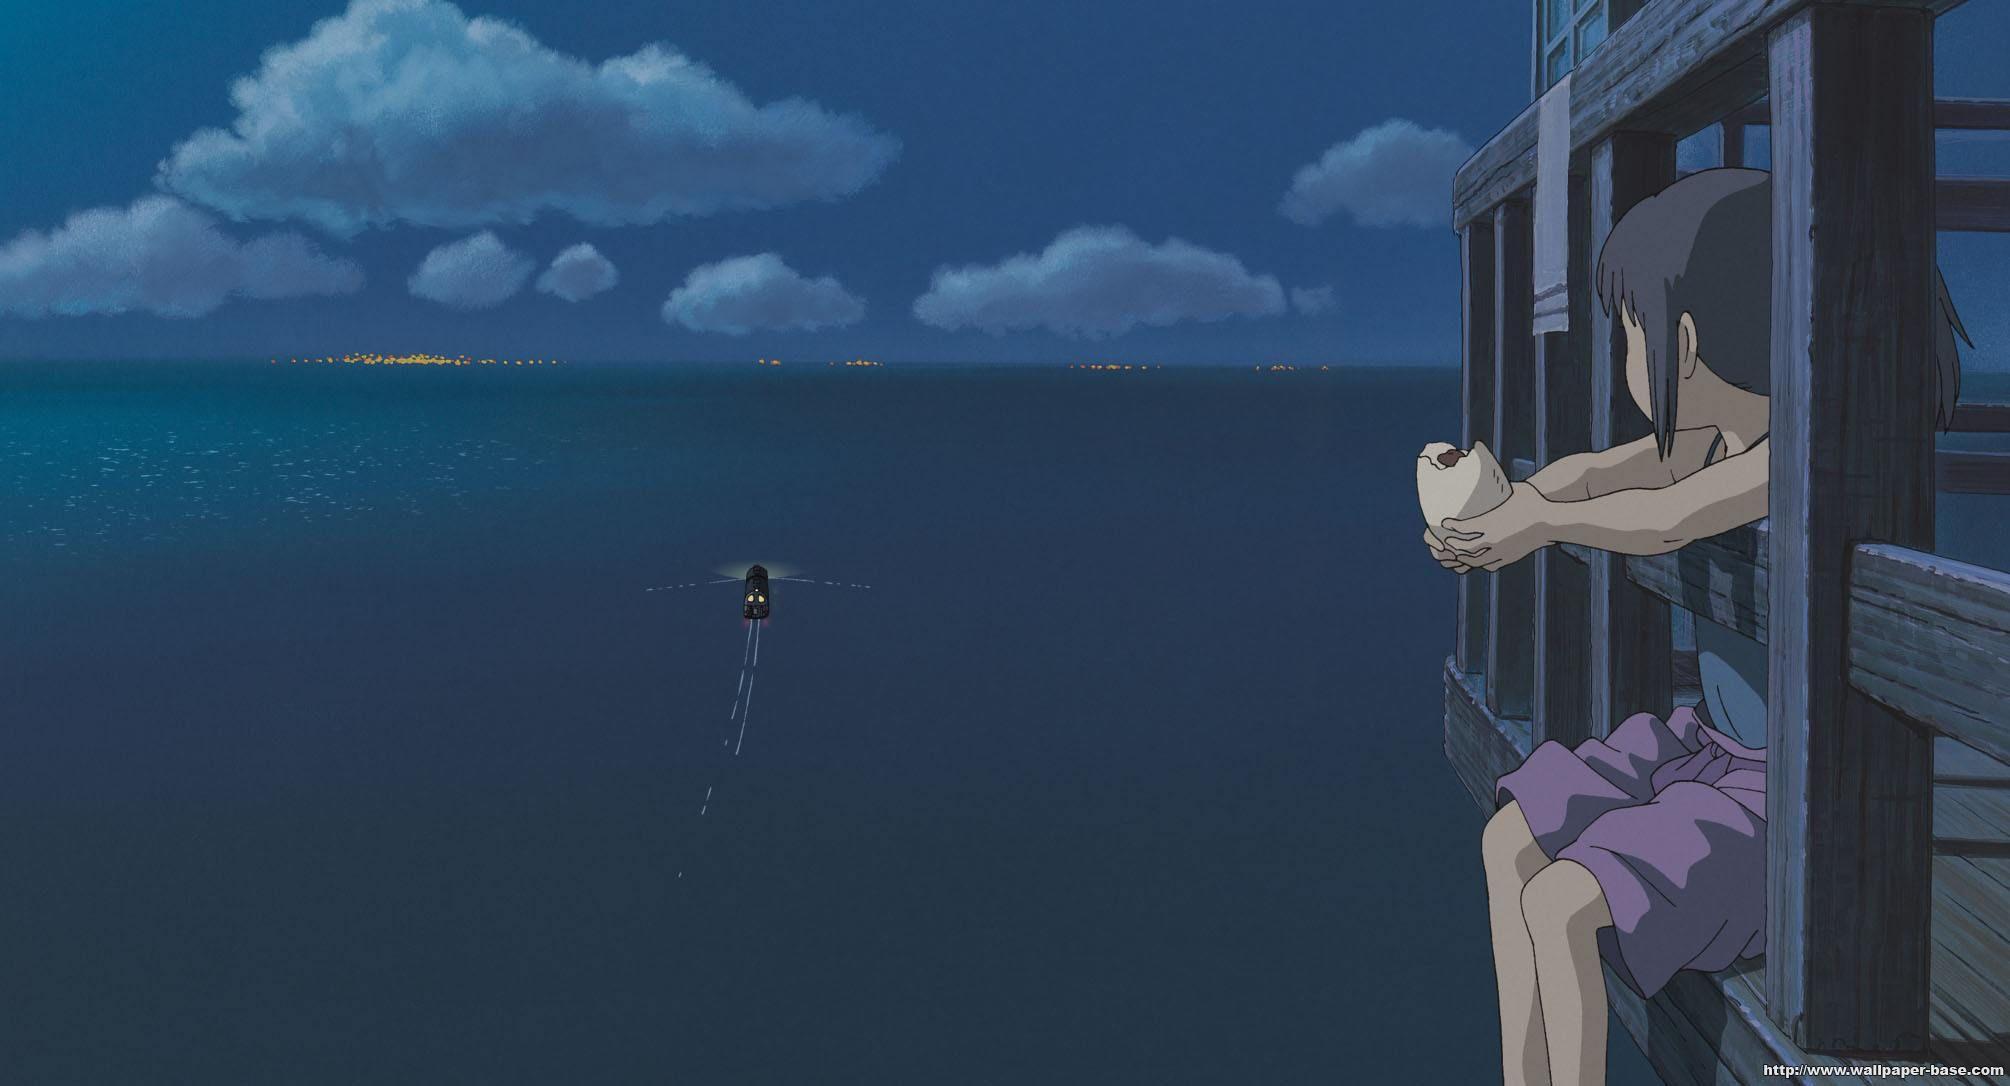 Spirited Away Le Voyage De Chihiro Fond D Ecran Pc Paysage Manga